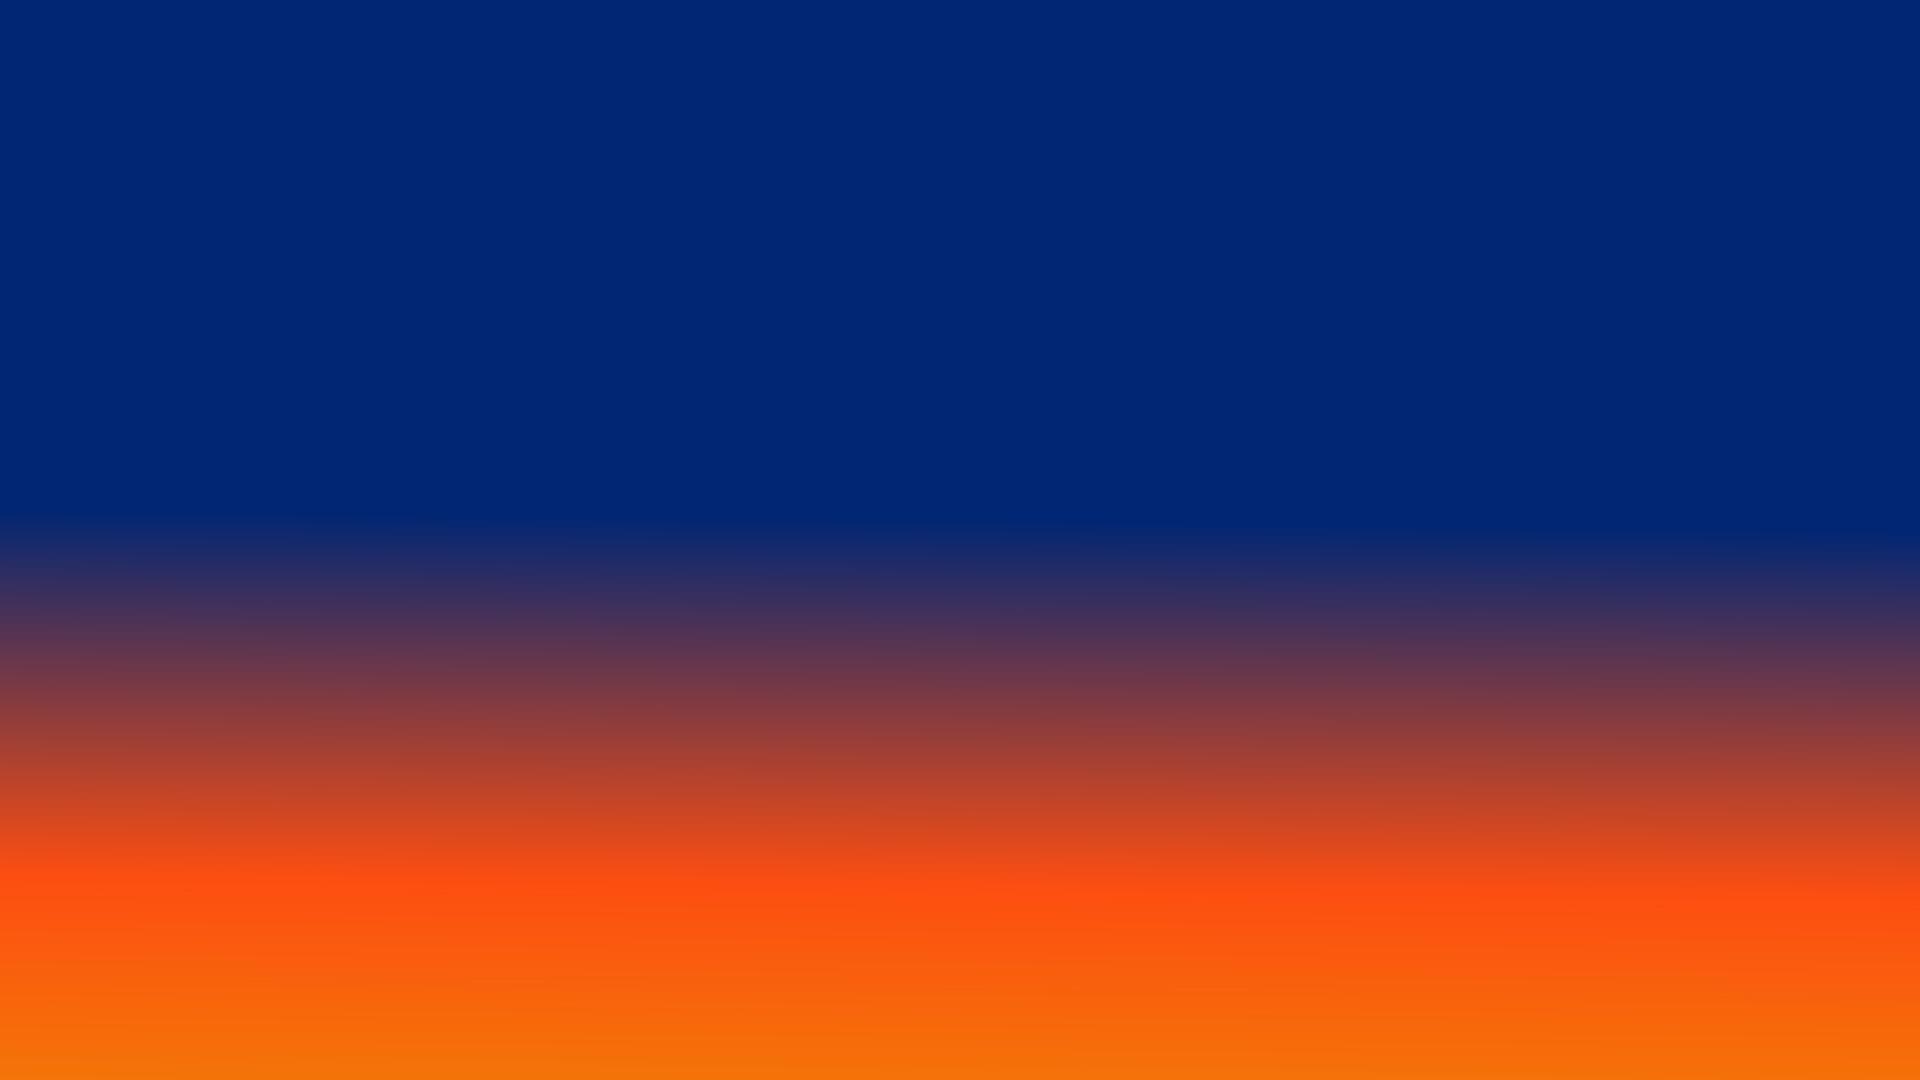 src/components/images/sky1.jpeg